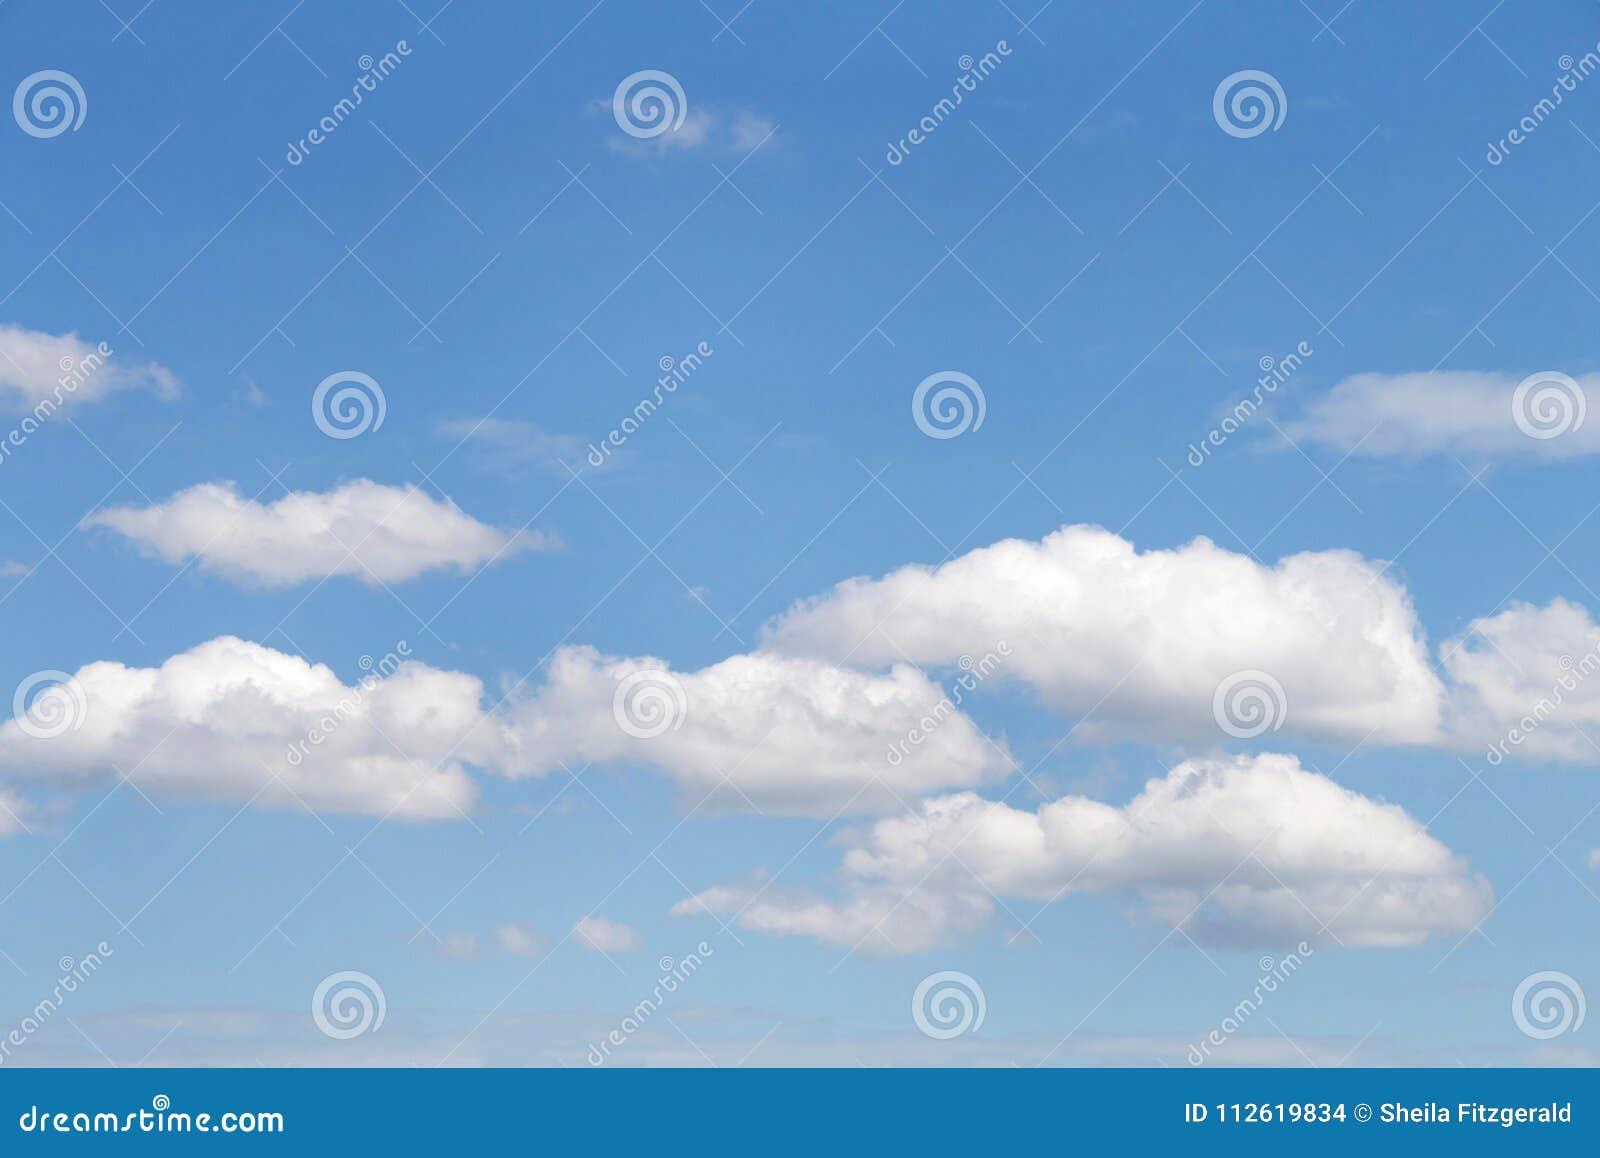 Tła cloudscape cumulusu chmury przeciw niebieskiemu niebu